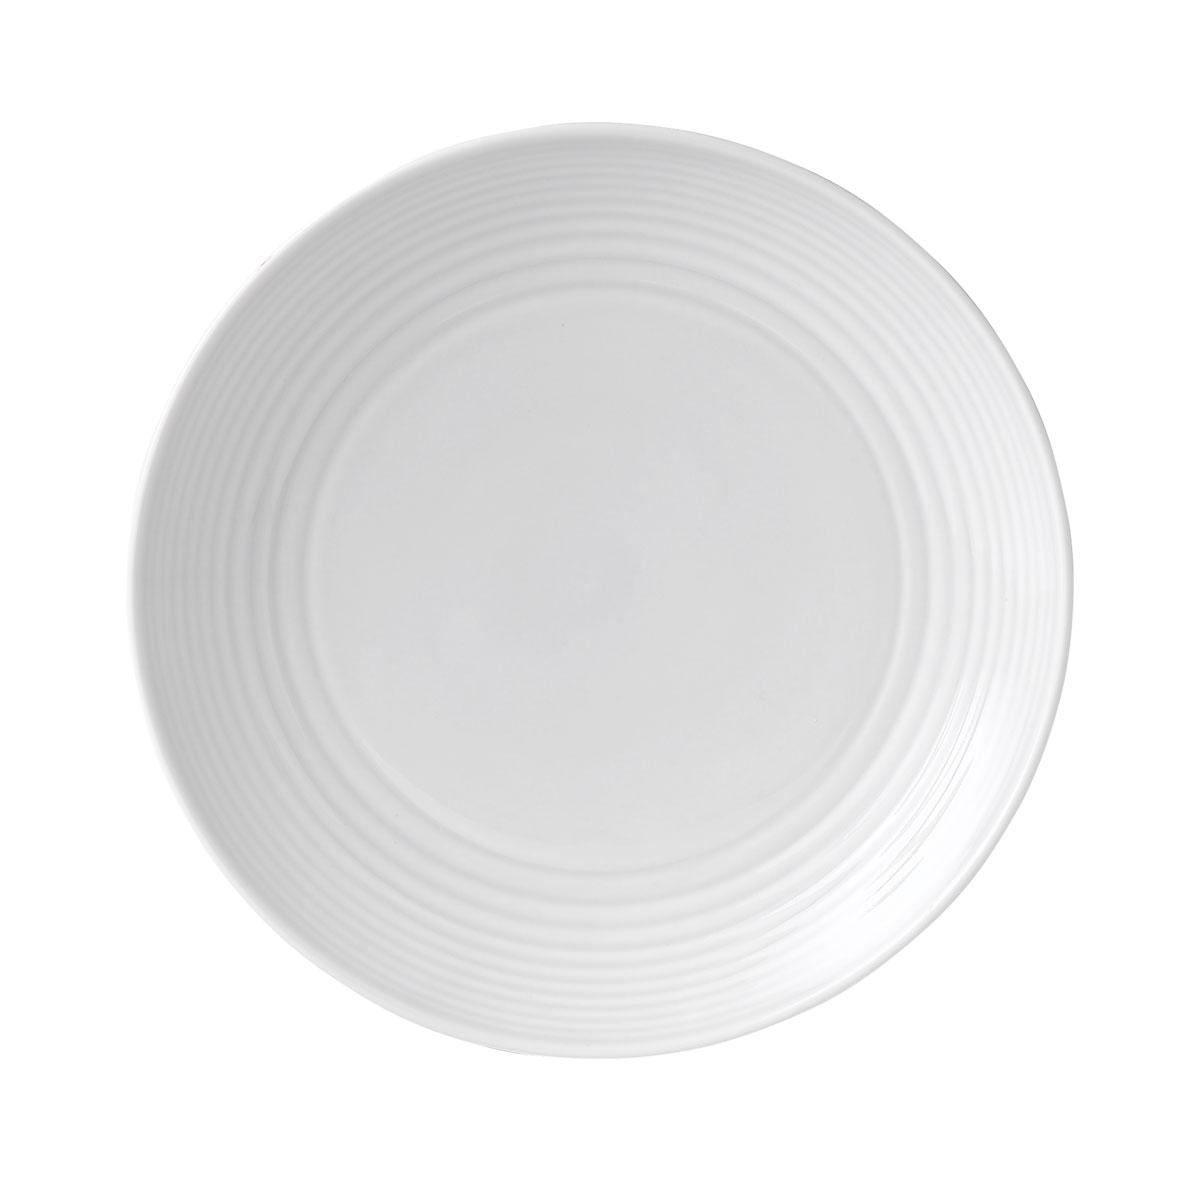 "Royal Doulton Gordon Ramsay Maze White Salad Plate 8.8"""